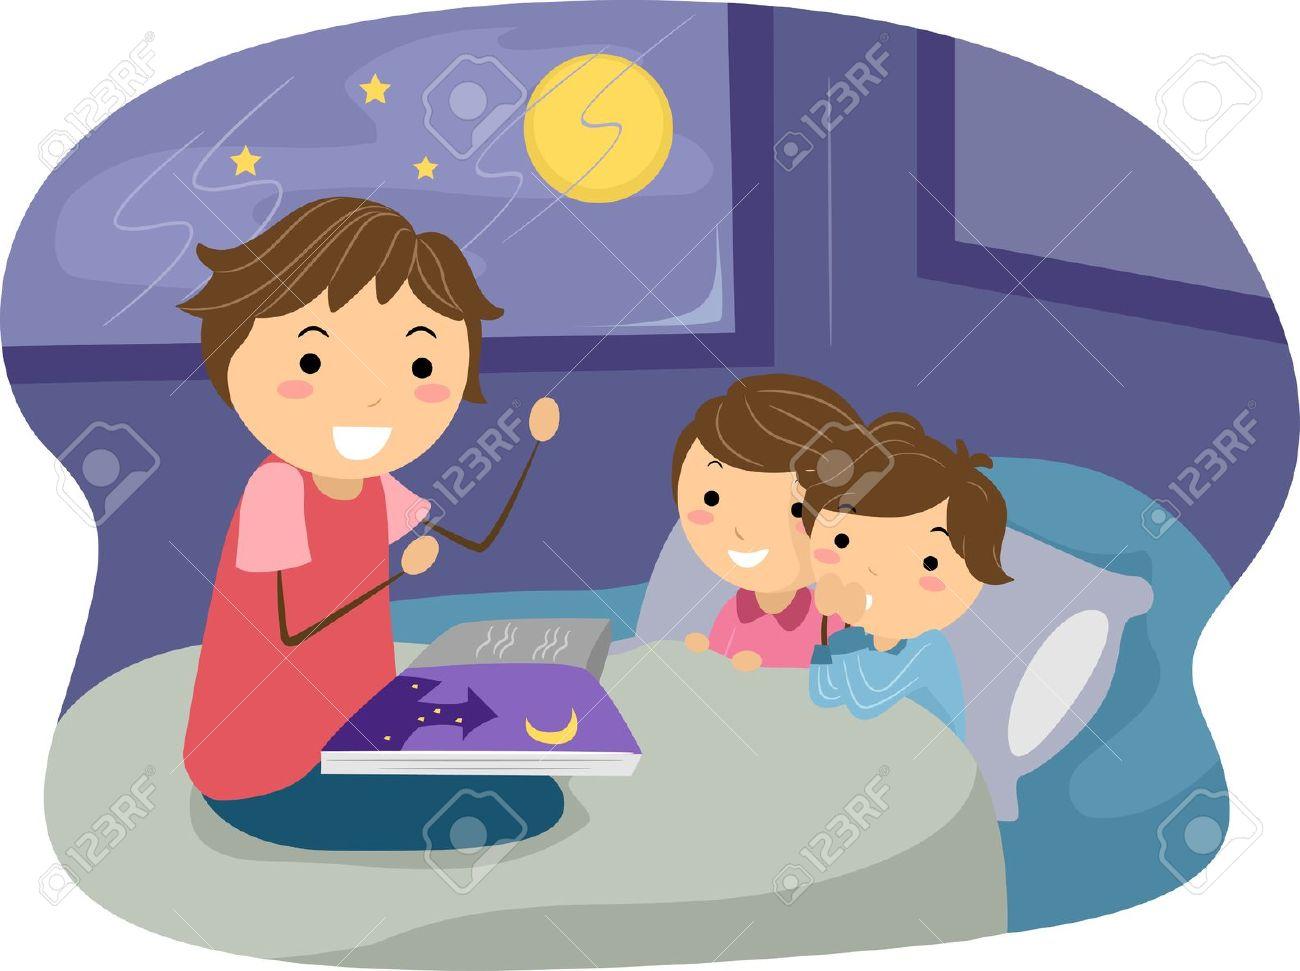 Uncategorized A Bed Time Story illustration of kids listening to a bedtime story stock photo 13340406